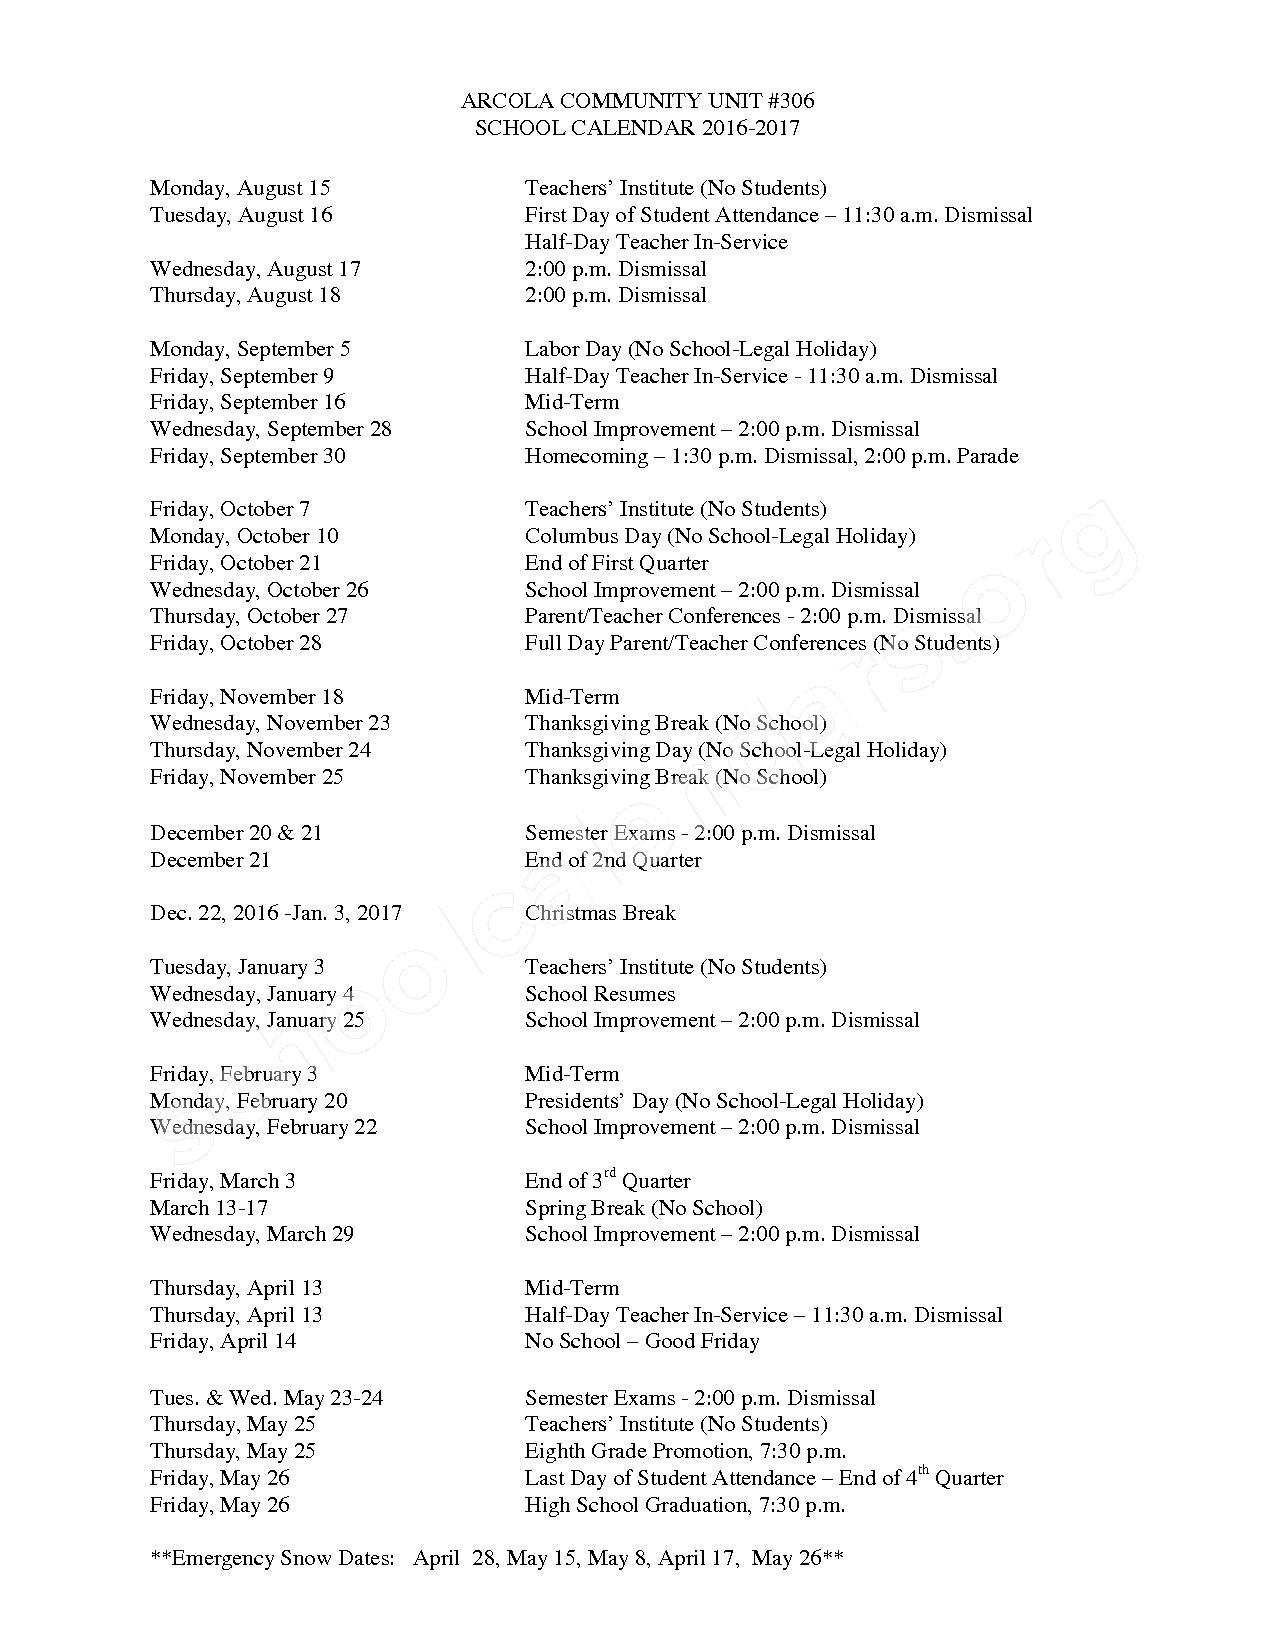 2016 - 2017 School Calendar – Arcola High School – page 1